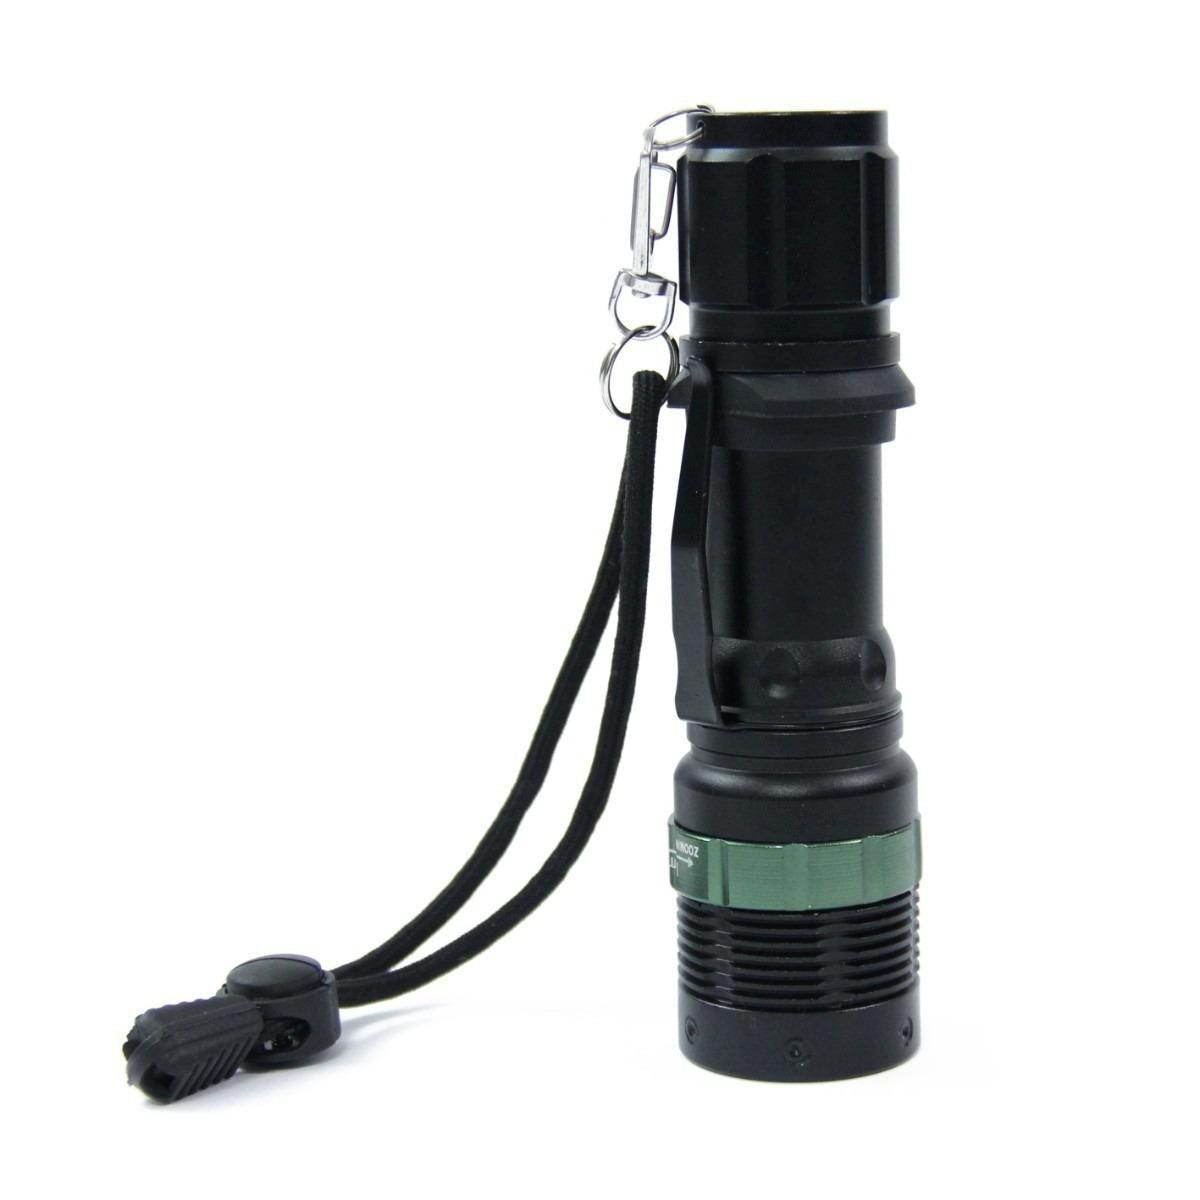 Mini Lanterna Tática Profissional Recarregável  - ILIMITI SHOP